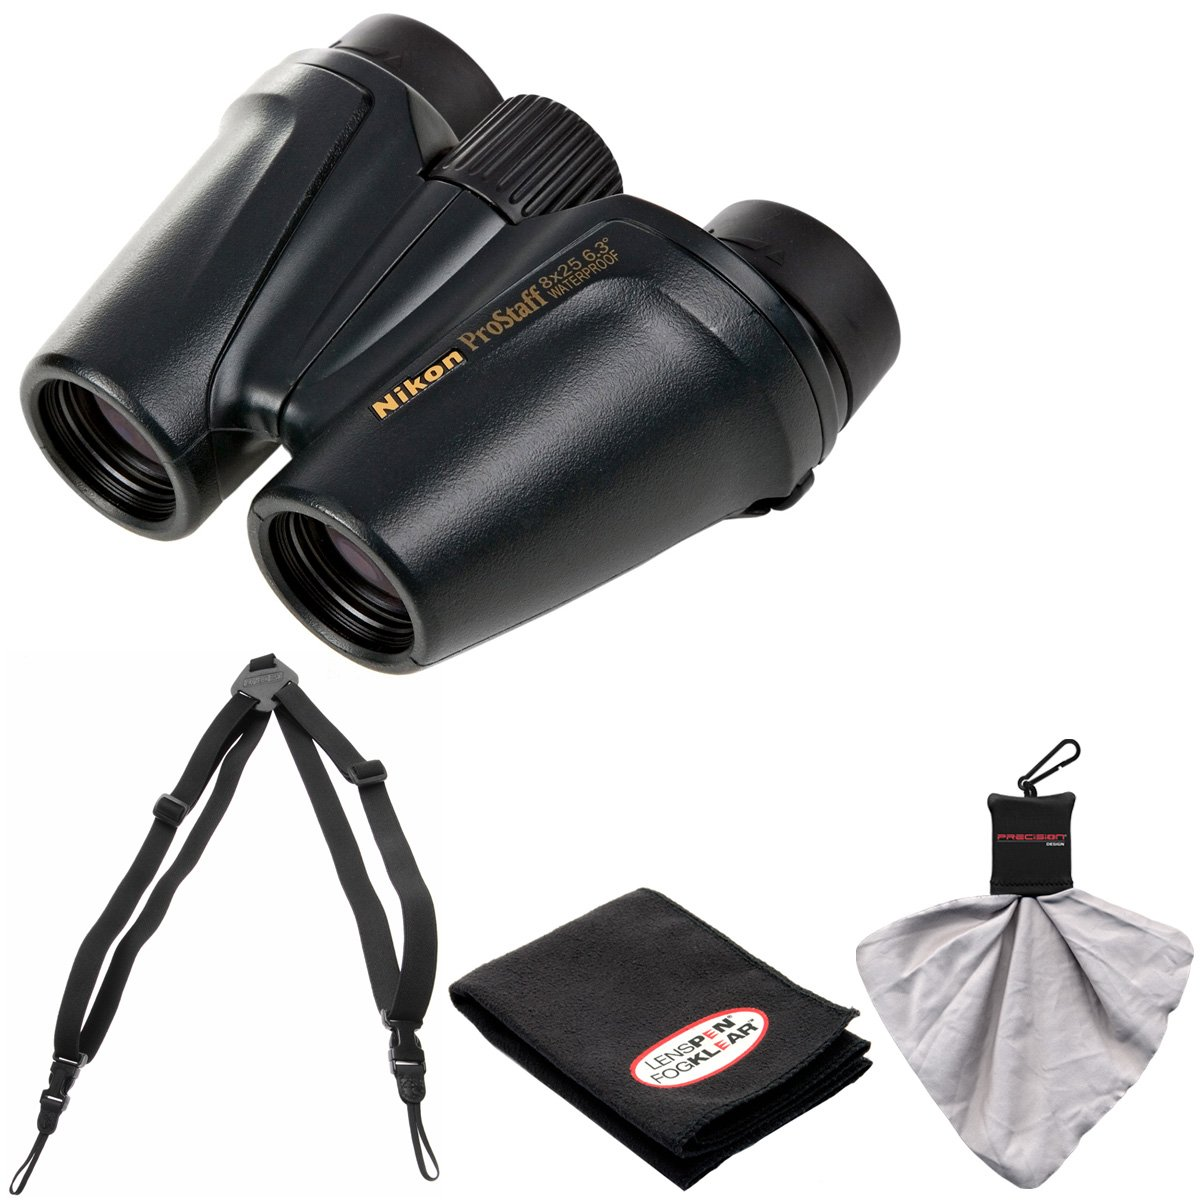 Nikon Prostaff 8 x 25防水/ Fogproof双眼鏡with Case +持ち運び簡単ハーネス+クリーニング布キット B01CPNGRWY